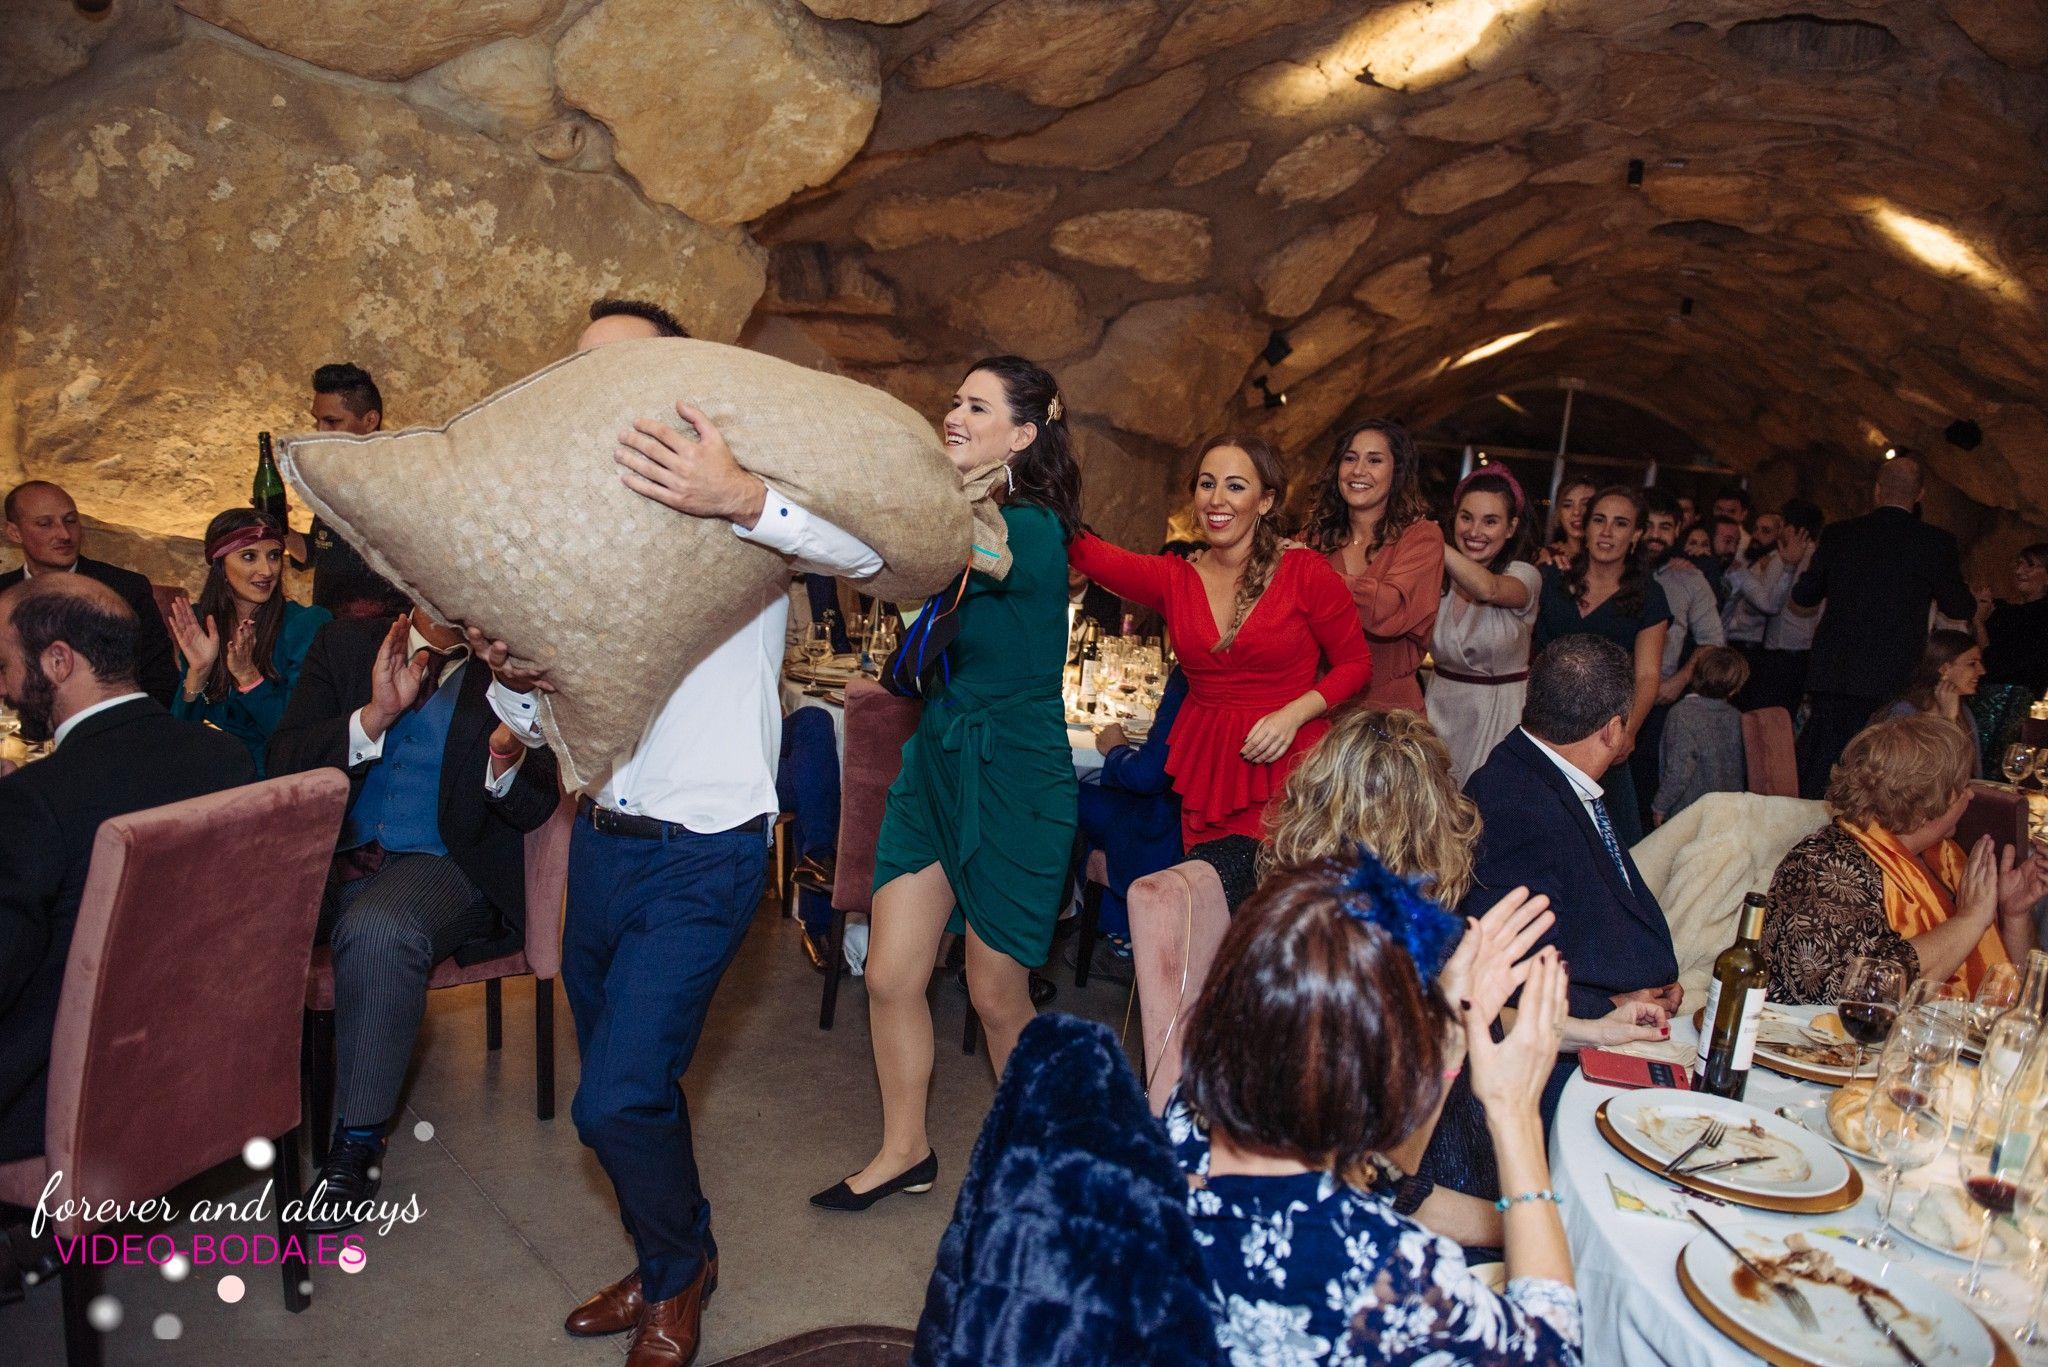 Esta fotografía emociona, reportajes únicos de boda en Valencia, España. Fotos de boda 2019 2020 #reportaje #boda #novios #Logroño #Rioja #Eguren #Ugarte #bodavalencia #valencia #novia #fotógrafo #bodas #religiosa #novios  #ruffles #fotografobodas #dulzura #dresscometrue #weddingphotography #weddingphotographers #weddingday #mejores #reportajes #ruffles #alegría